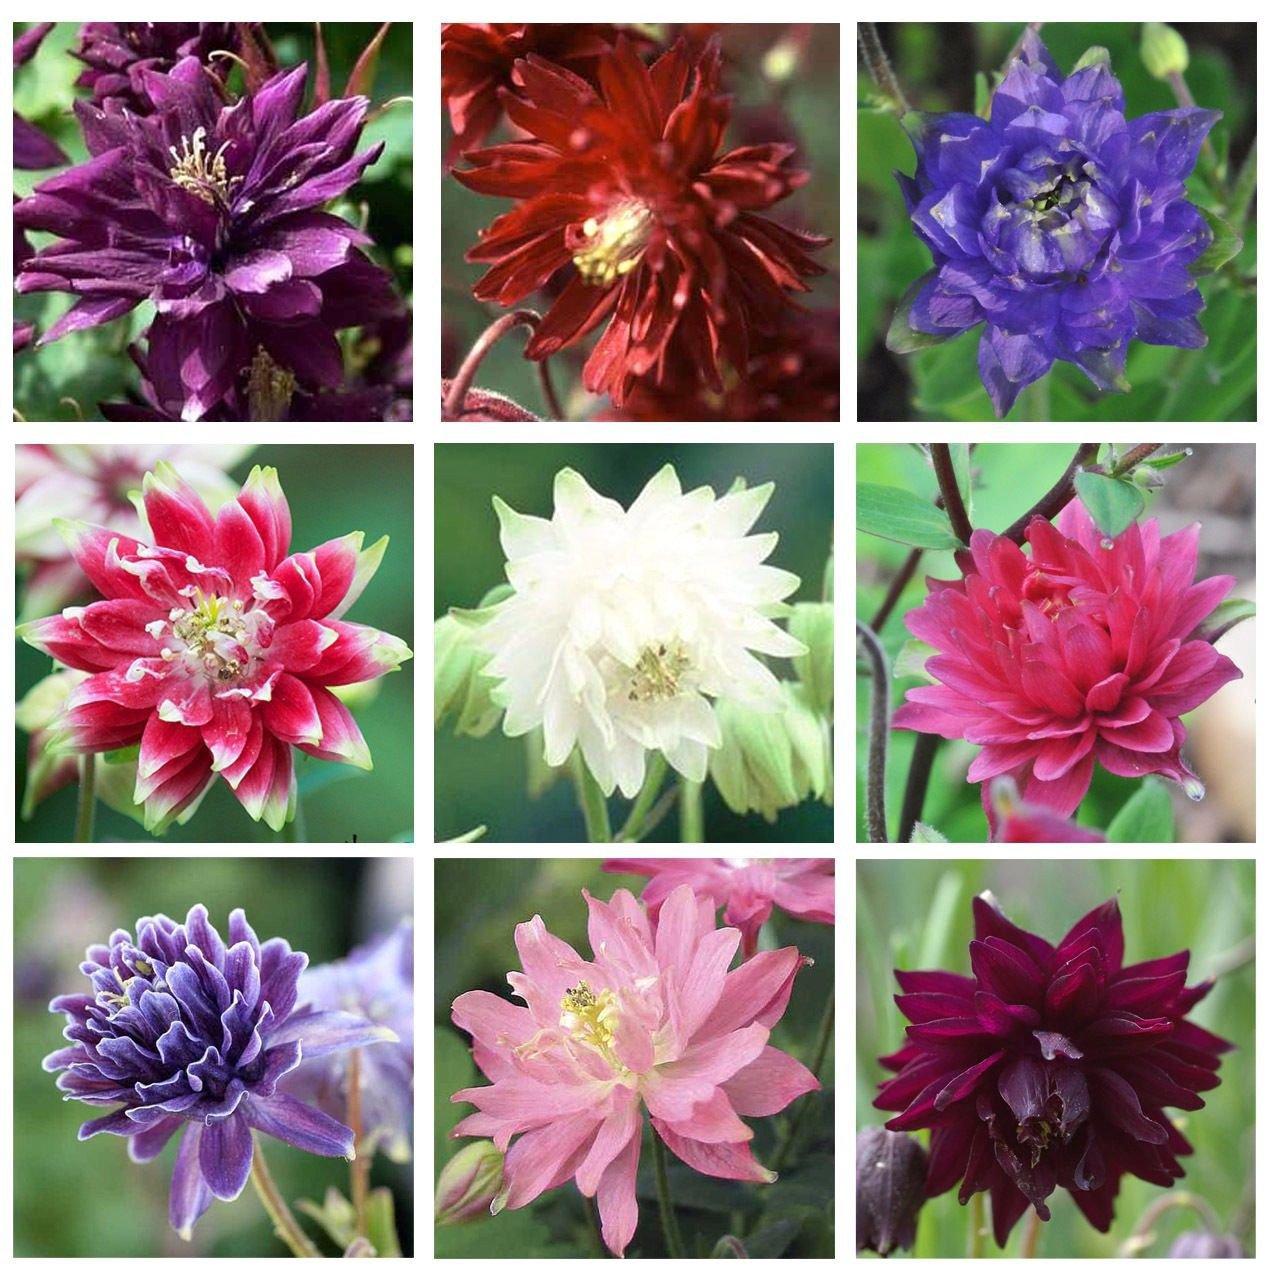 Columbine tall double mix 100 seeds Aquilegia vulgaris *Gardening *SHIPPING FROM US* CombSH A76